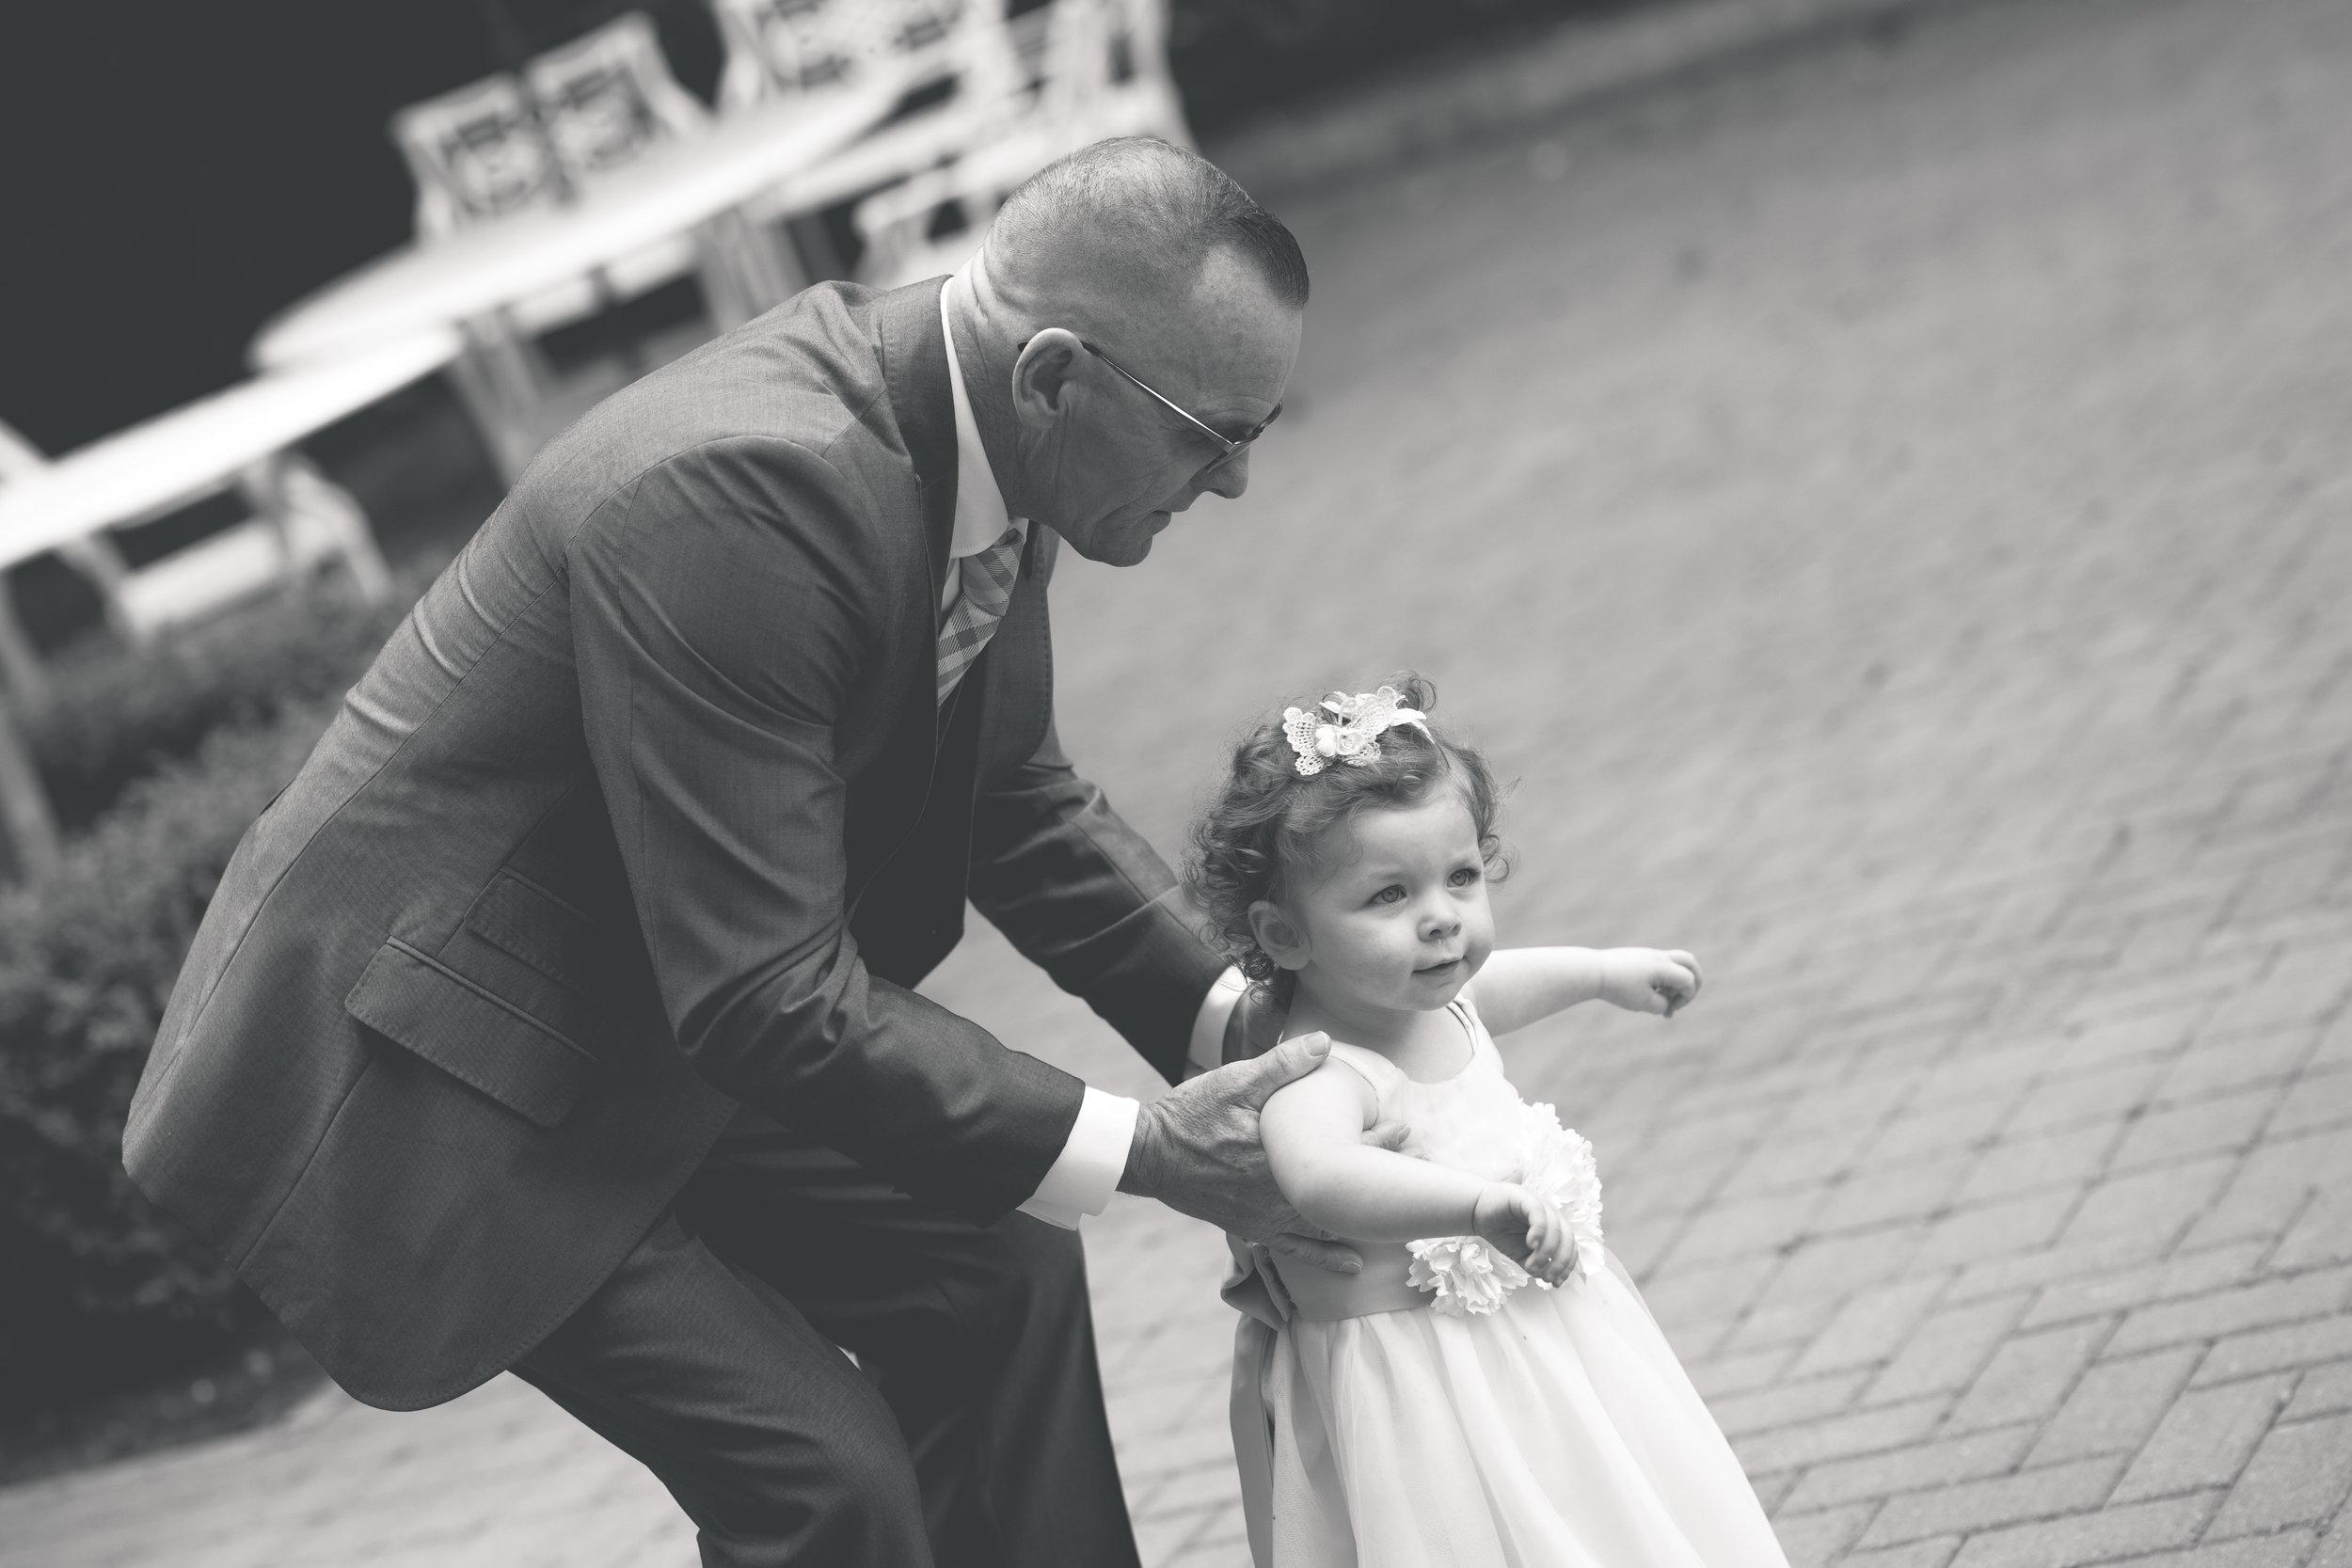 Antoinette & Stephen - Portraits | Brian McEwan Photography | Wedding Photographer Northern Ireland 63.jpg